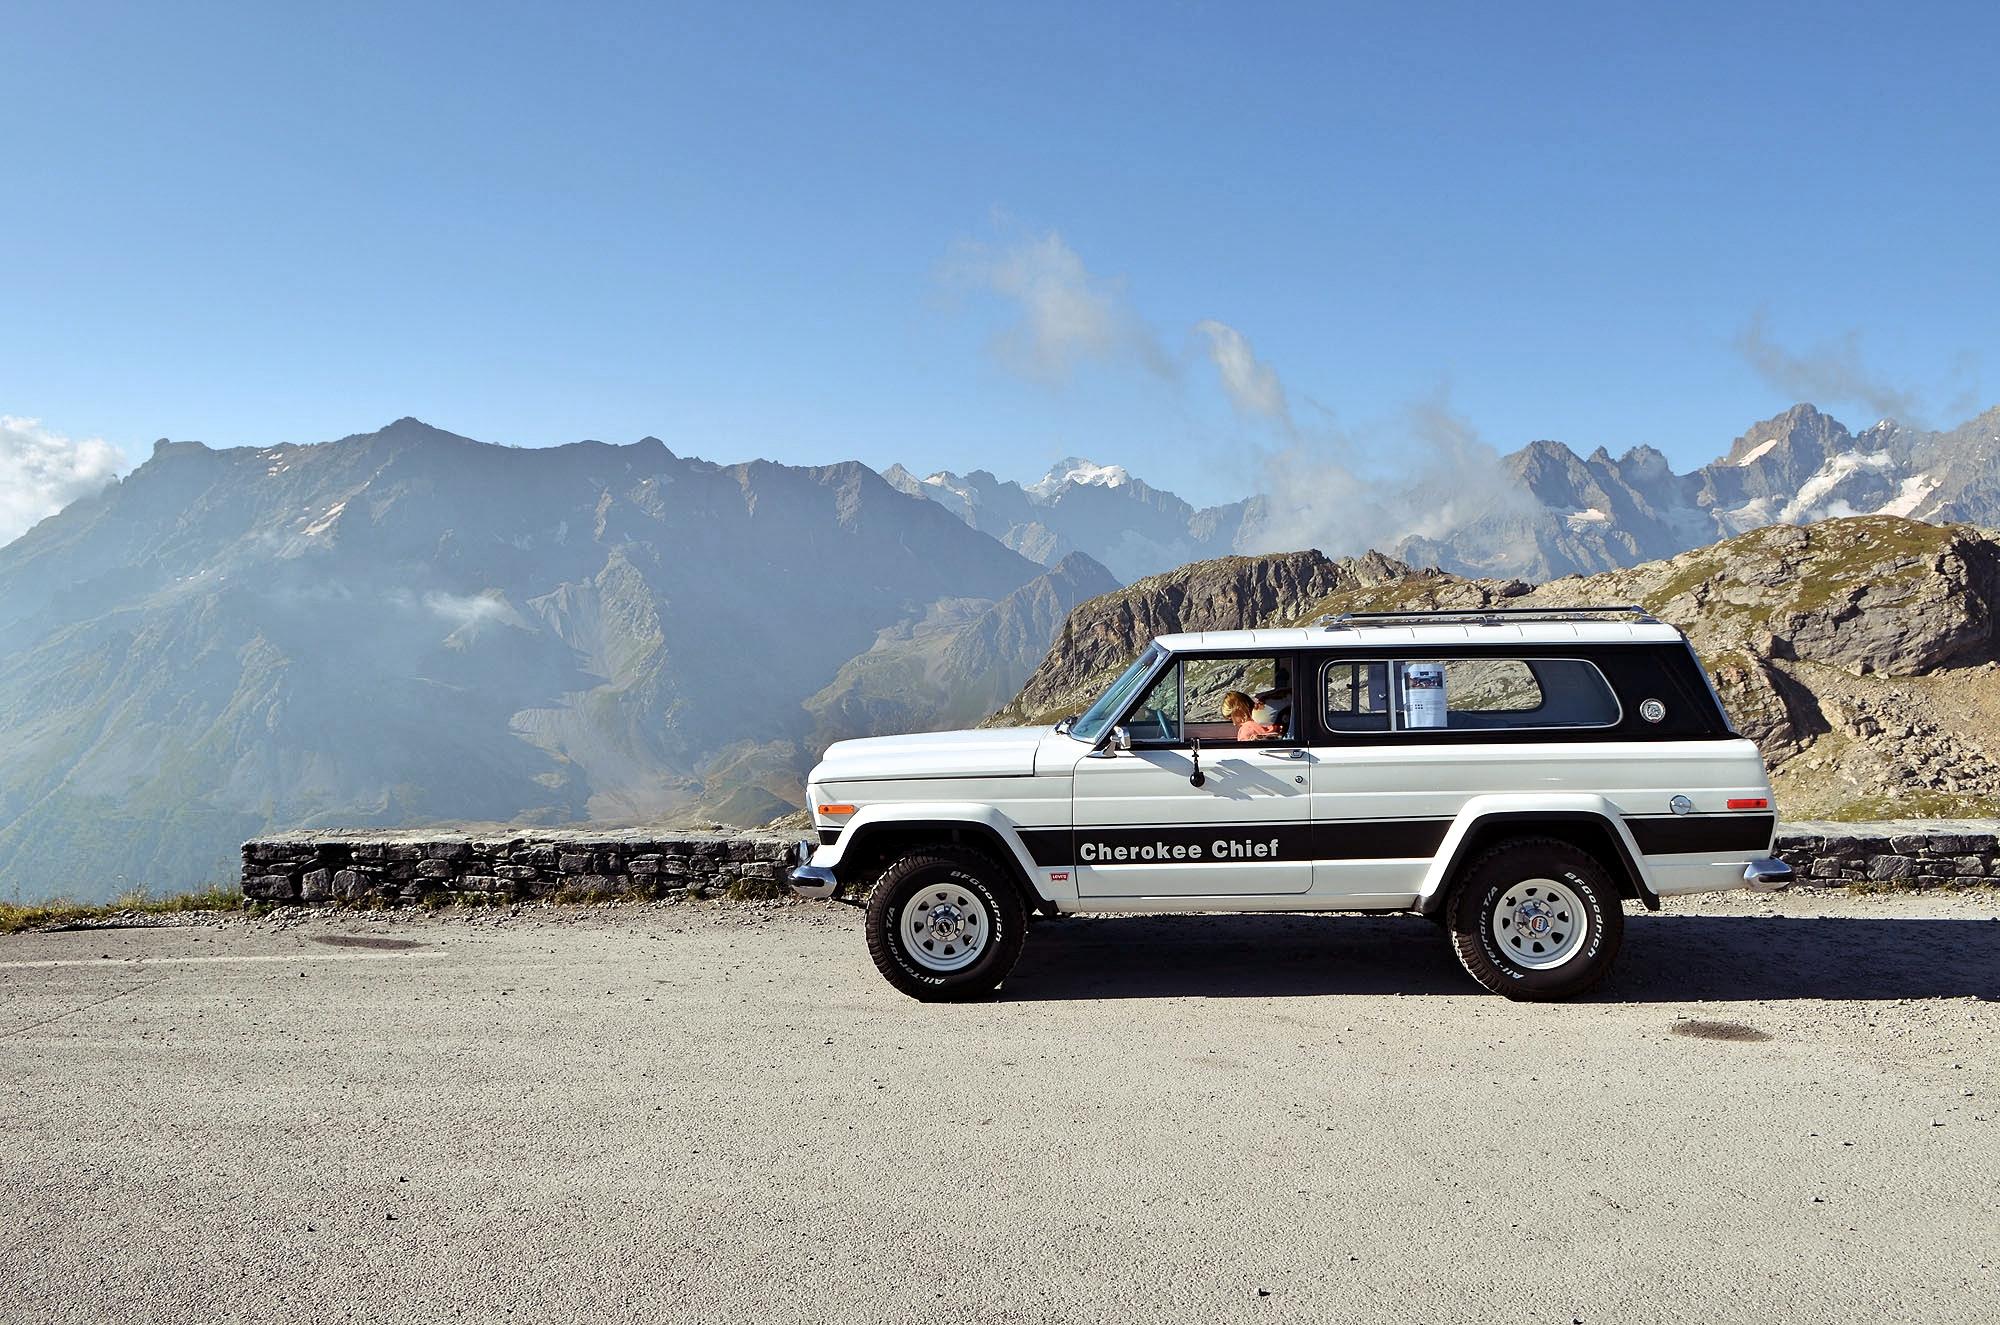 jeep-cherokee-chief-valloire-100.JPG